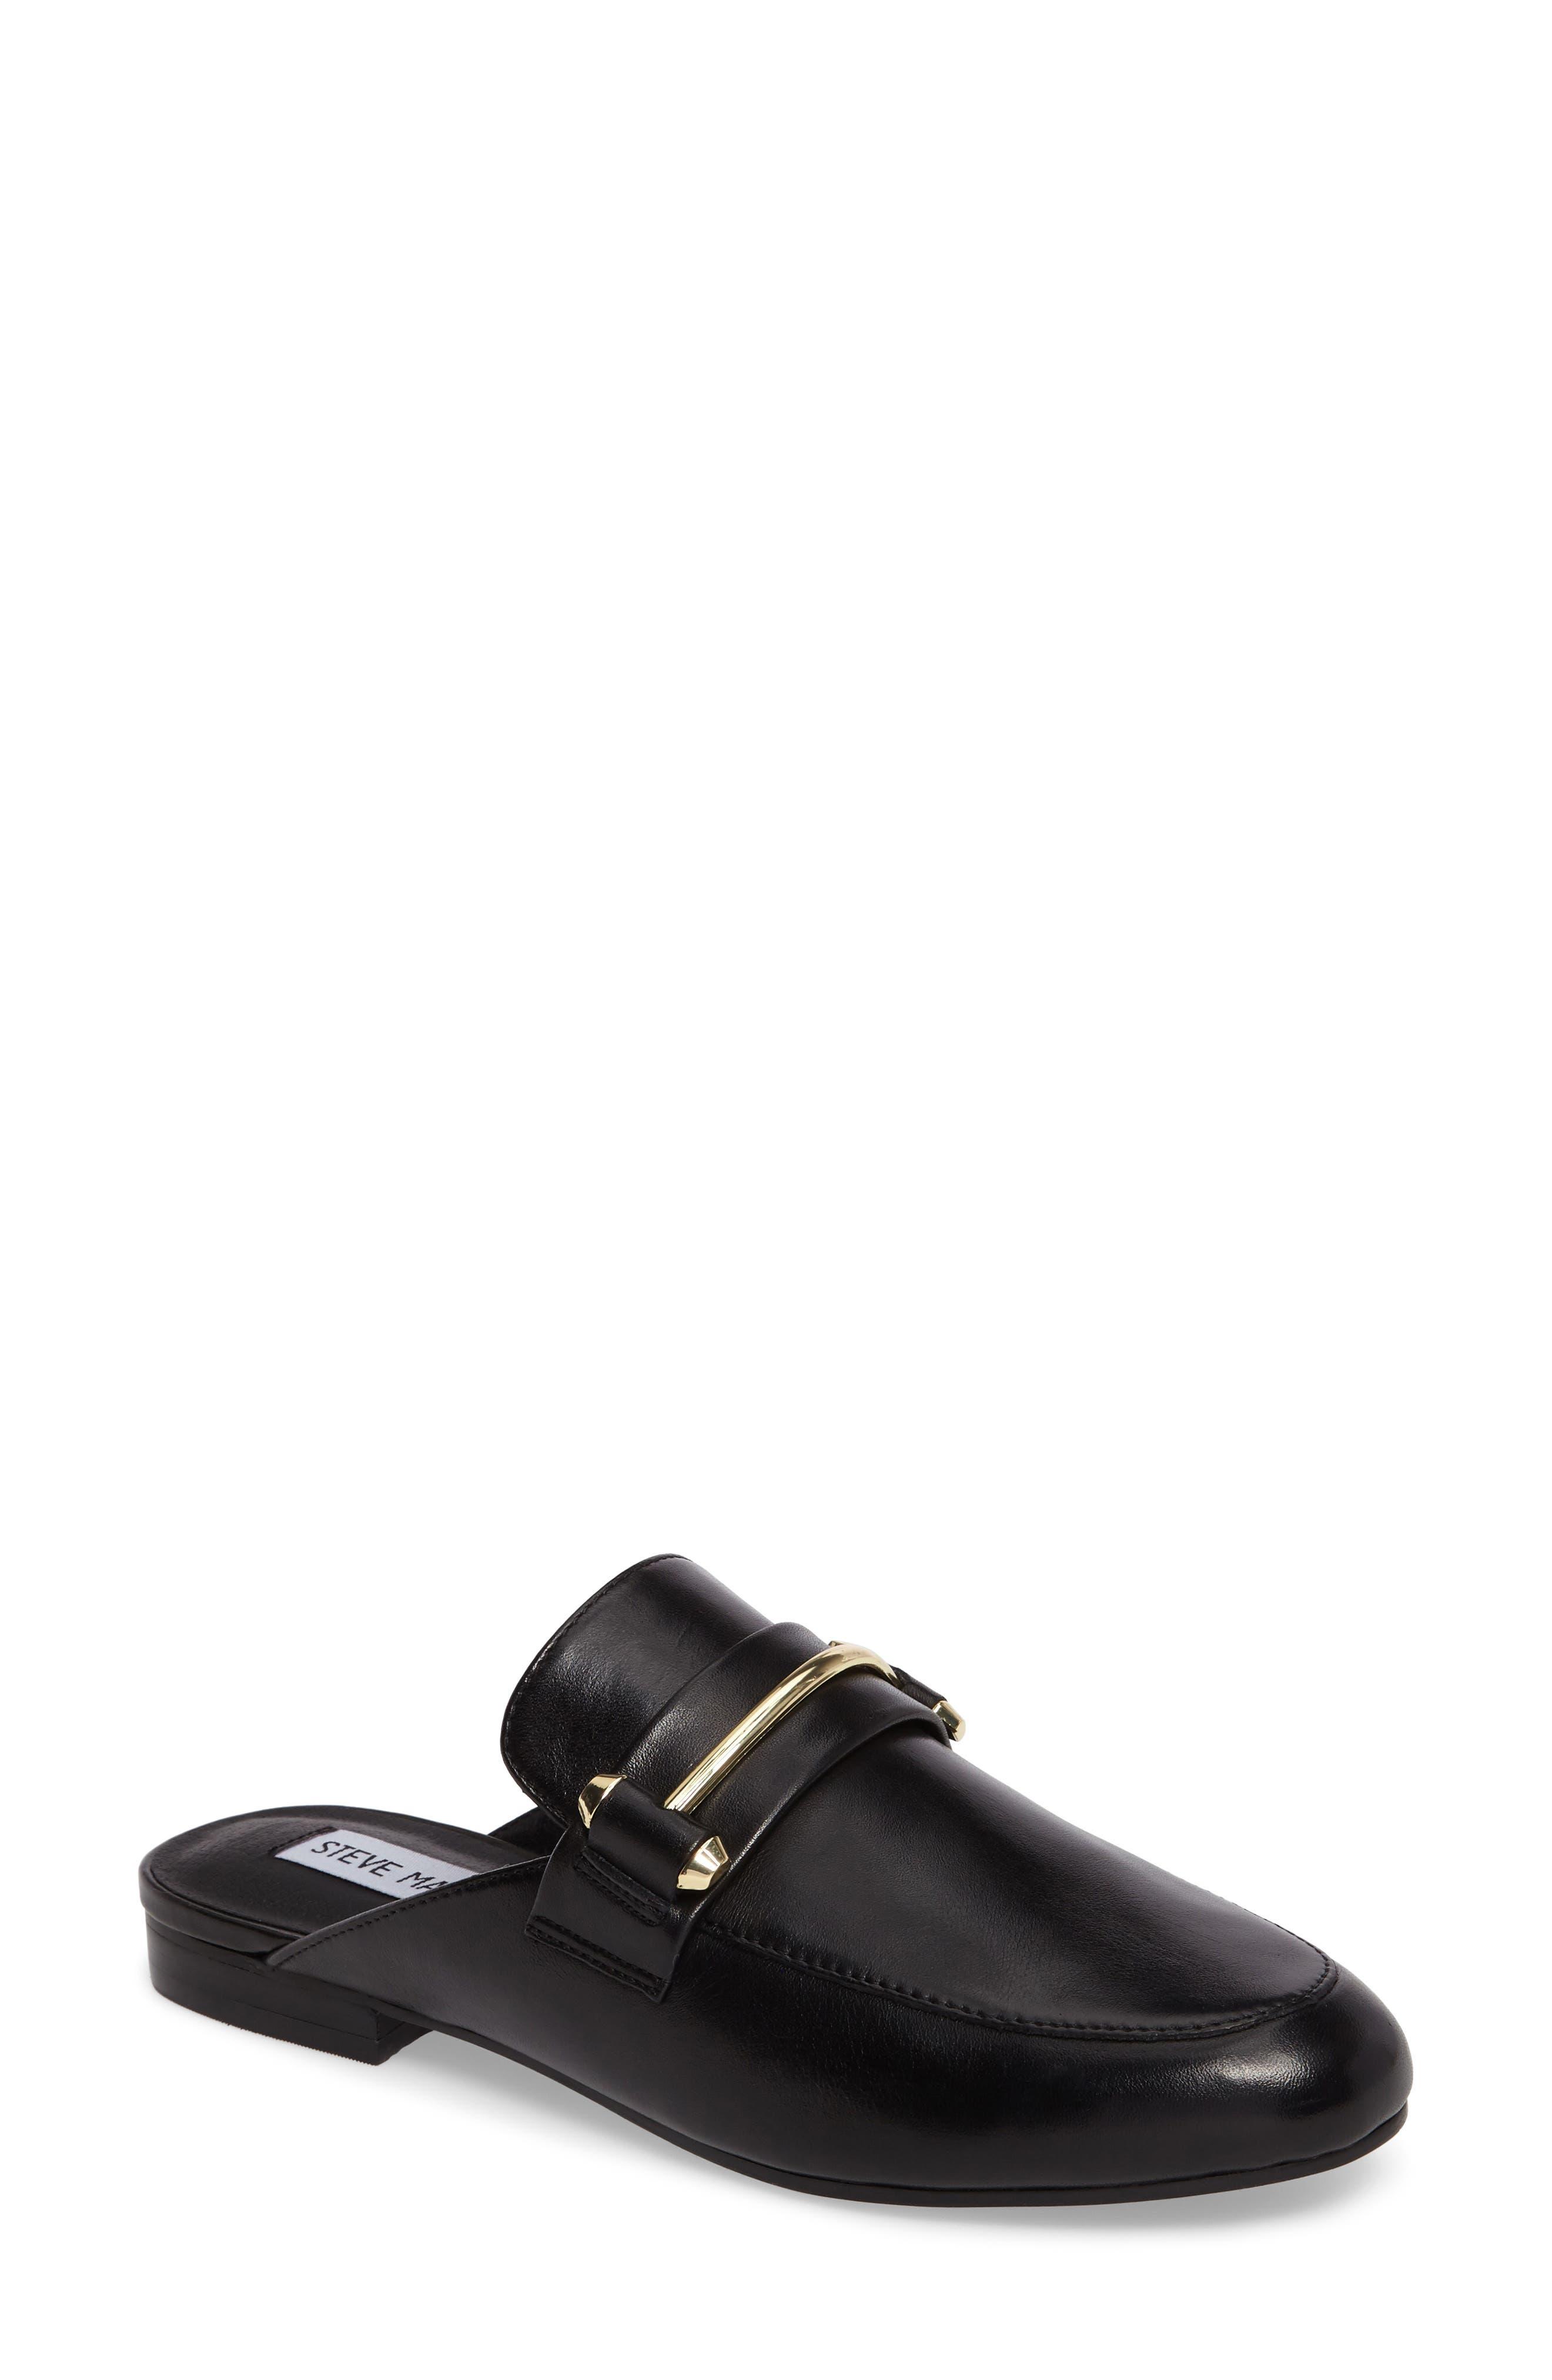 Kera Flat Loafer Mule,                             Main thumbnail 1, color,                             Black Leather